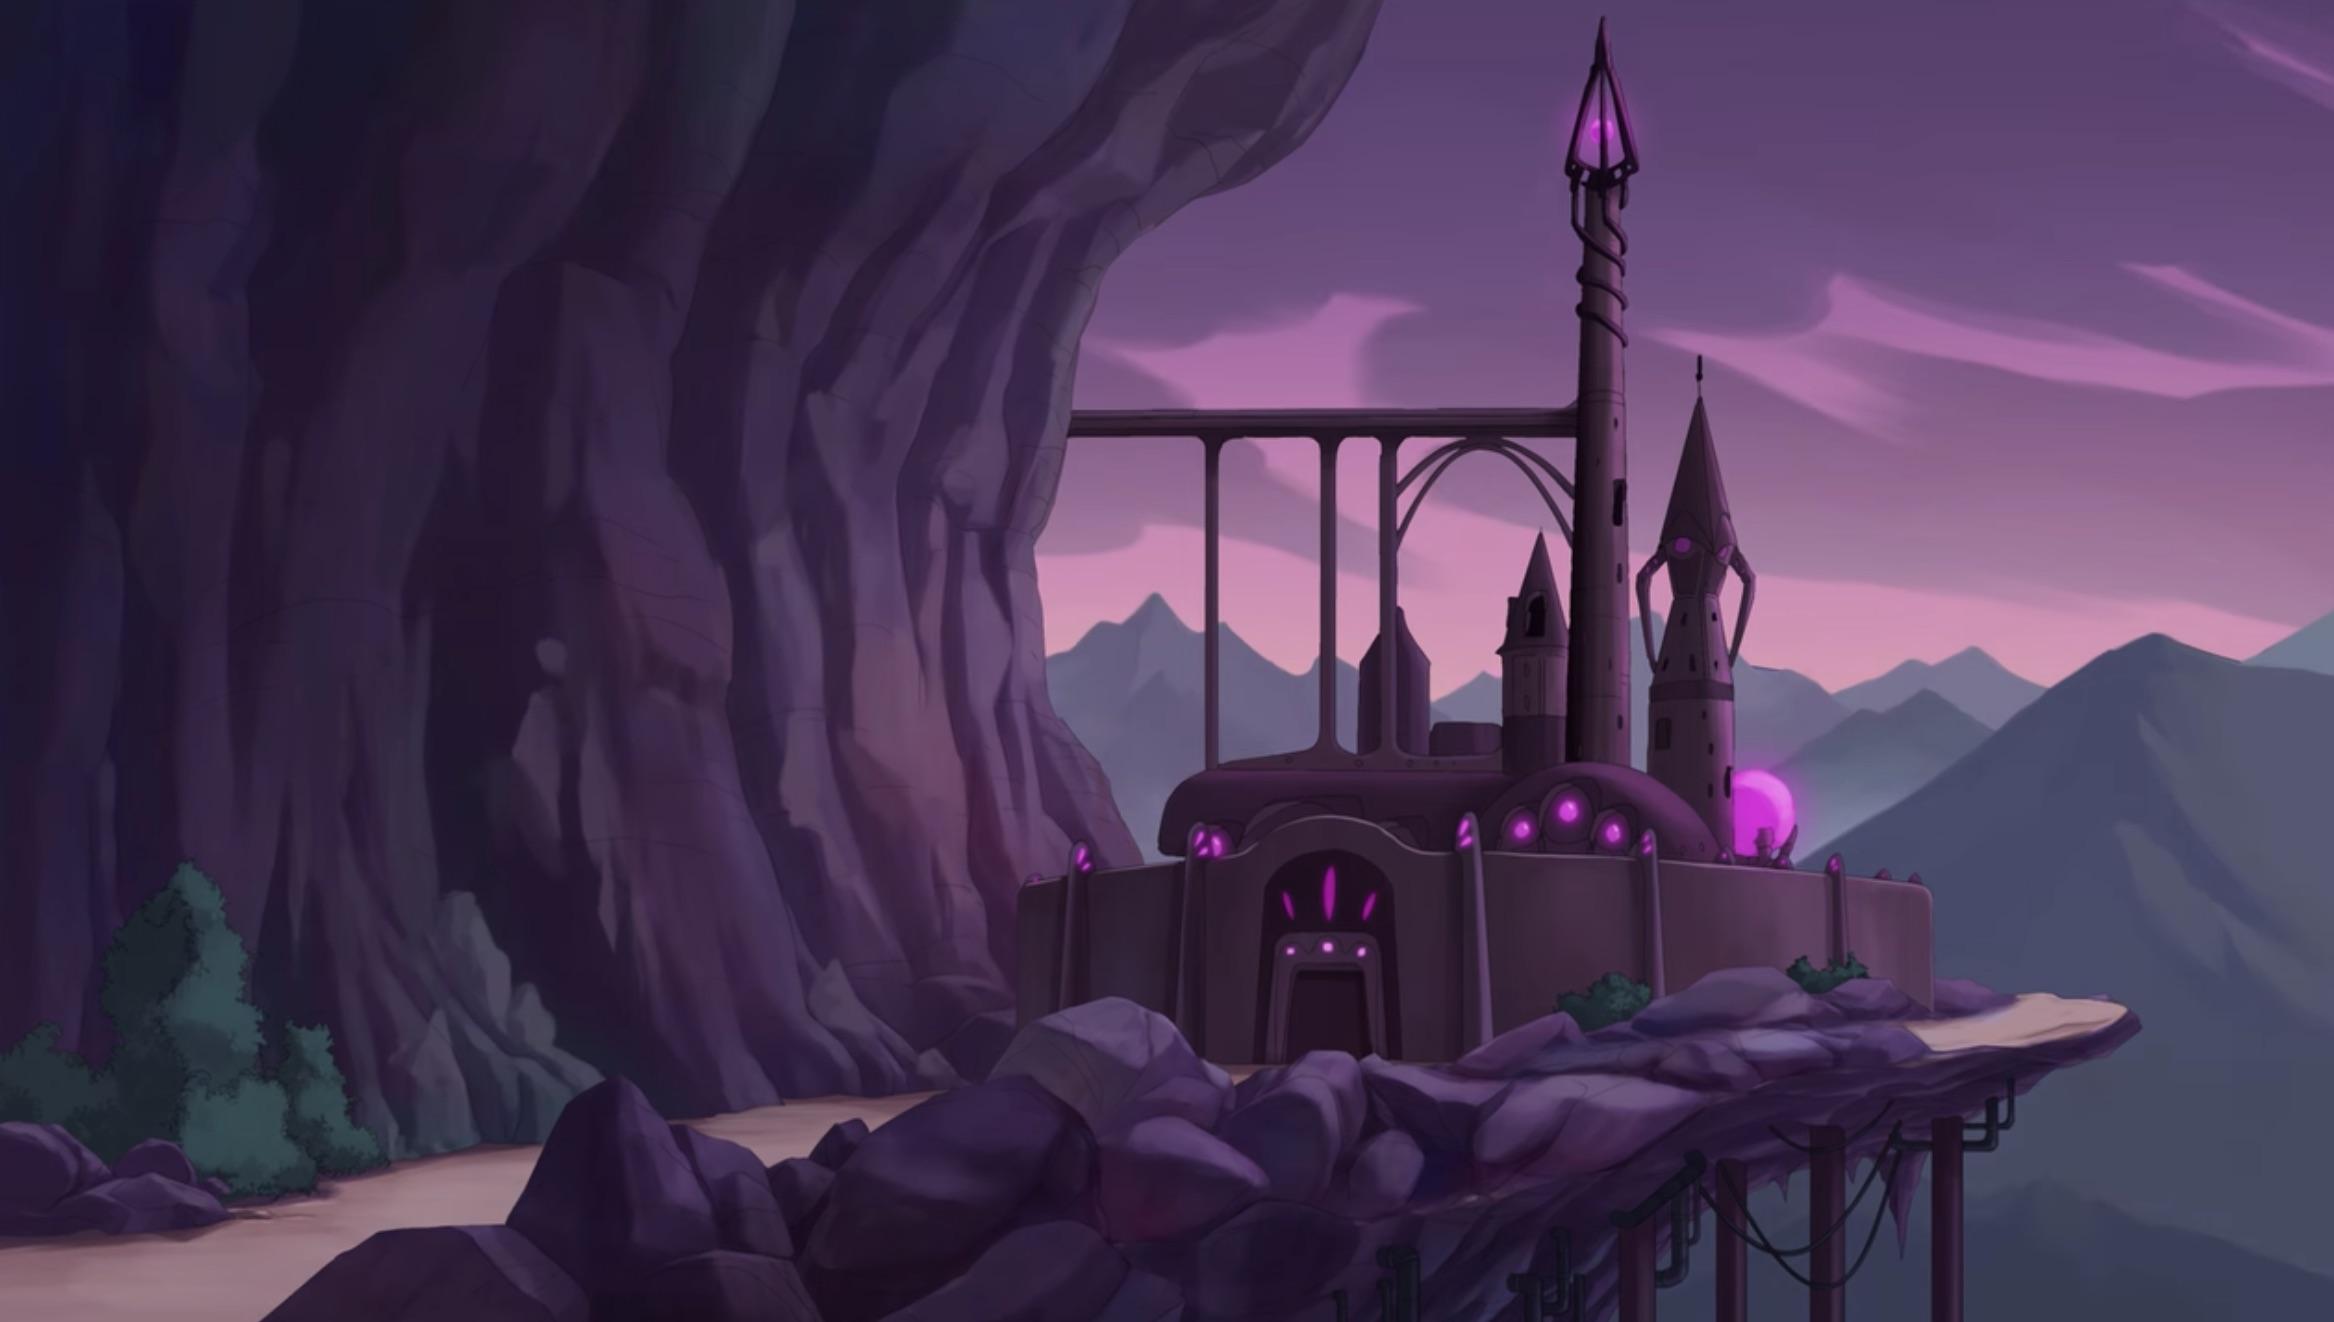 Dryl (She-Ra and the Princesses of Power)